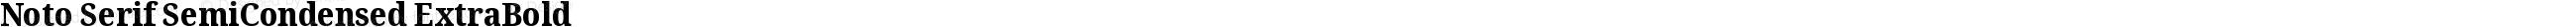 Noto Serif SemiCondensed ExtraBold